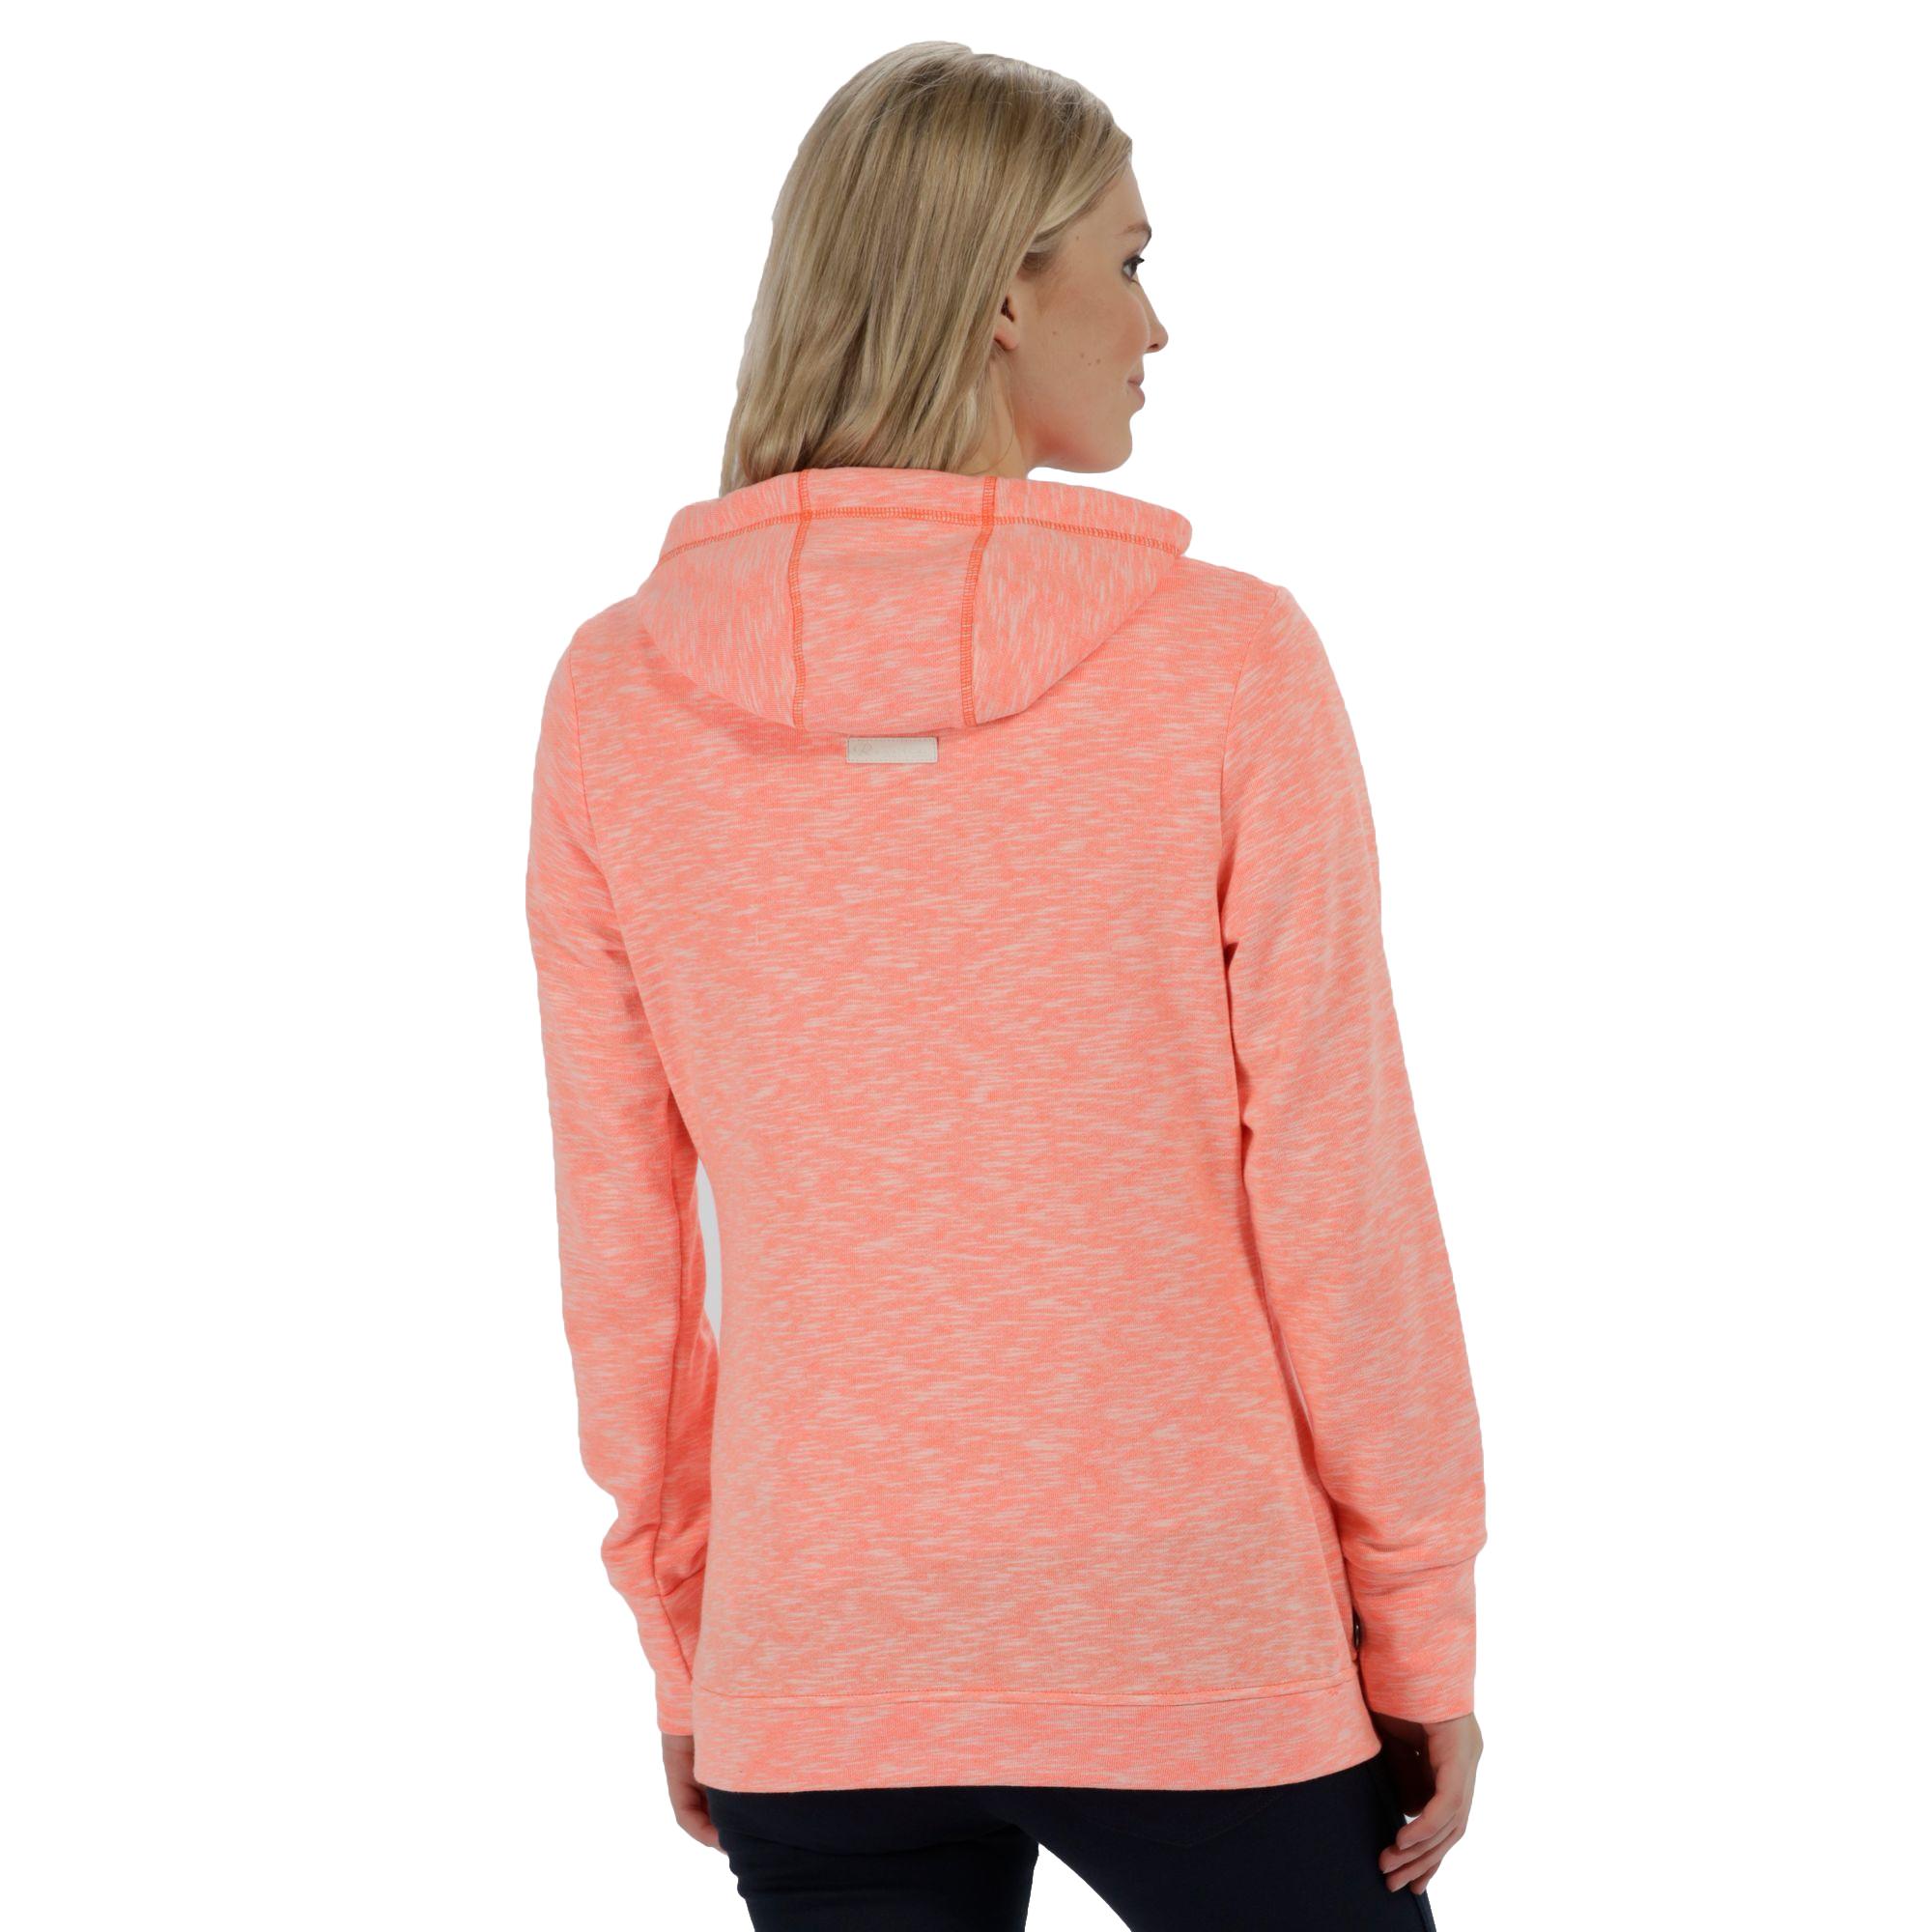 Regatta-Ramosa-Womens-Full-Zip-Hoodie-Hooded-Fleece-Jacket-RRP-50 thumbnail 7